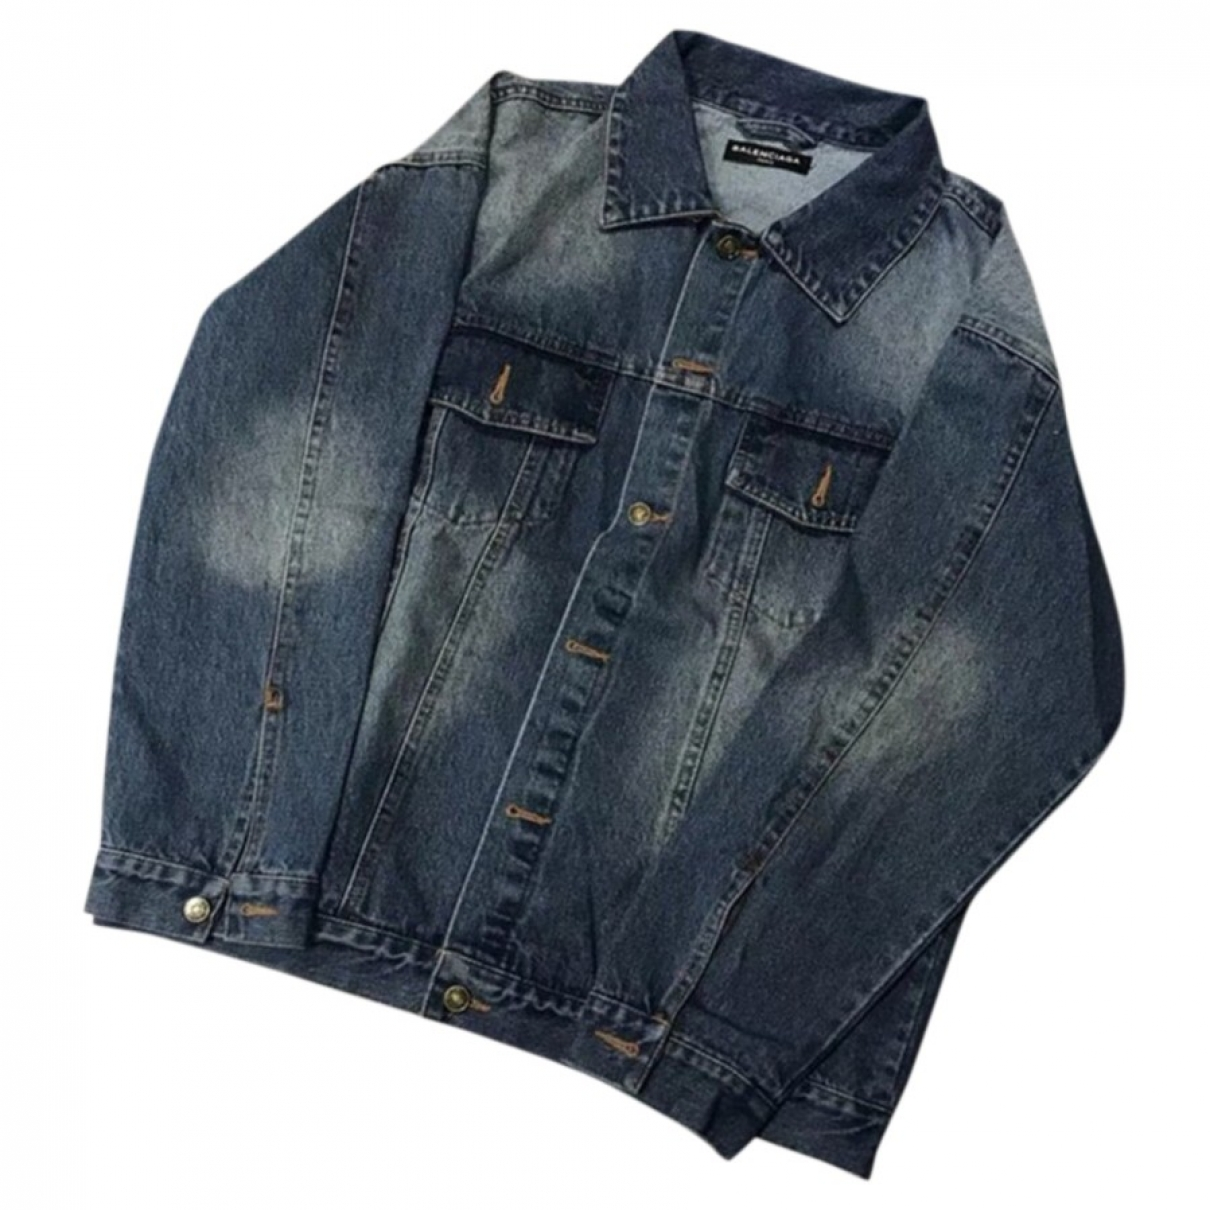 Balenciaga \N Blue Denim - Jeans jacket  for Men M